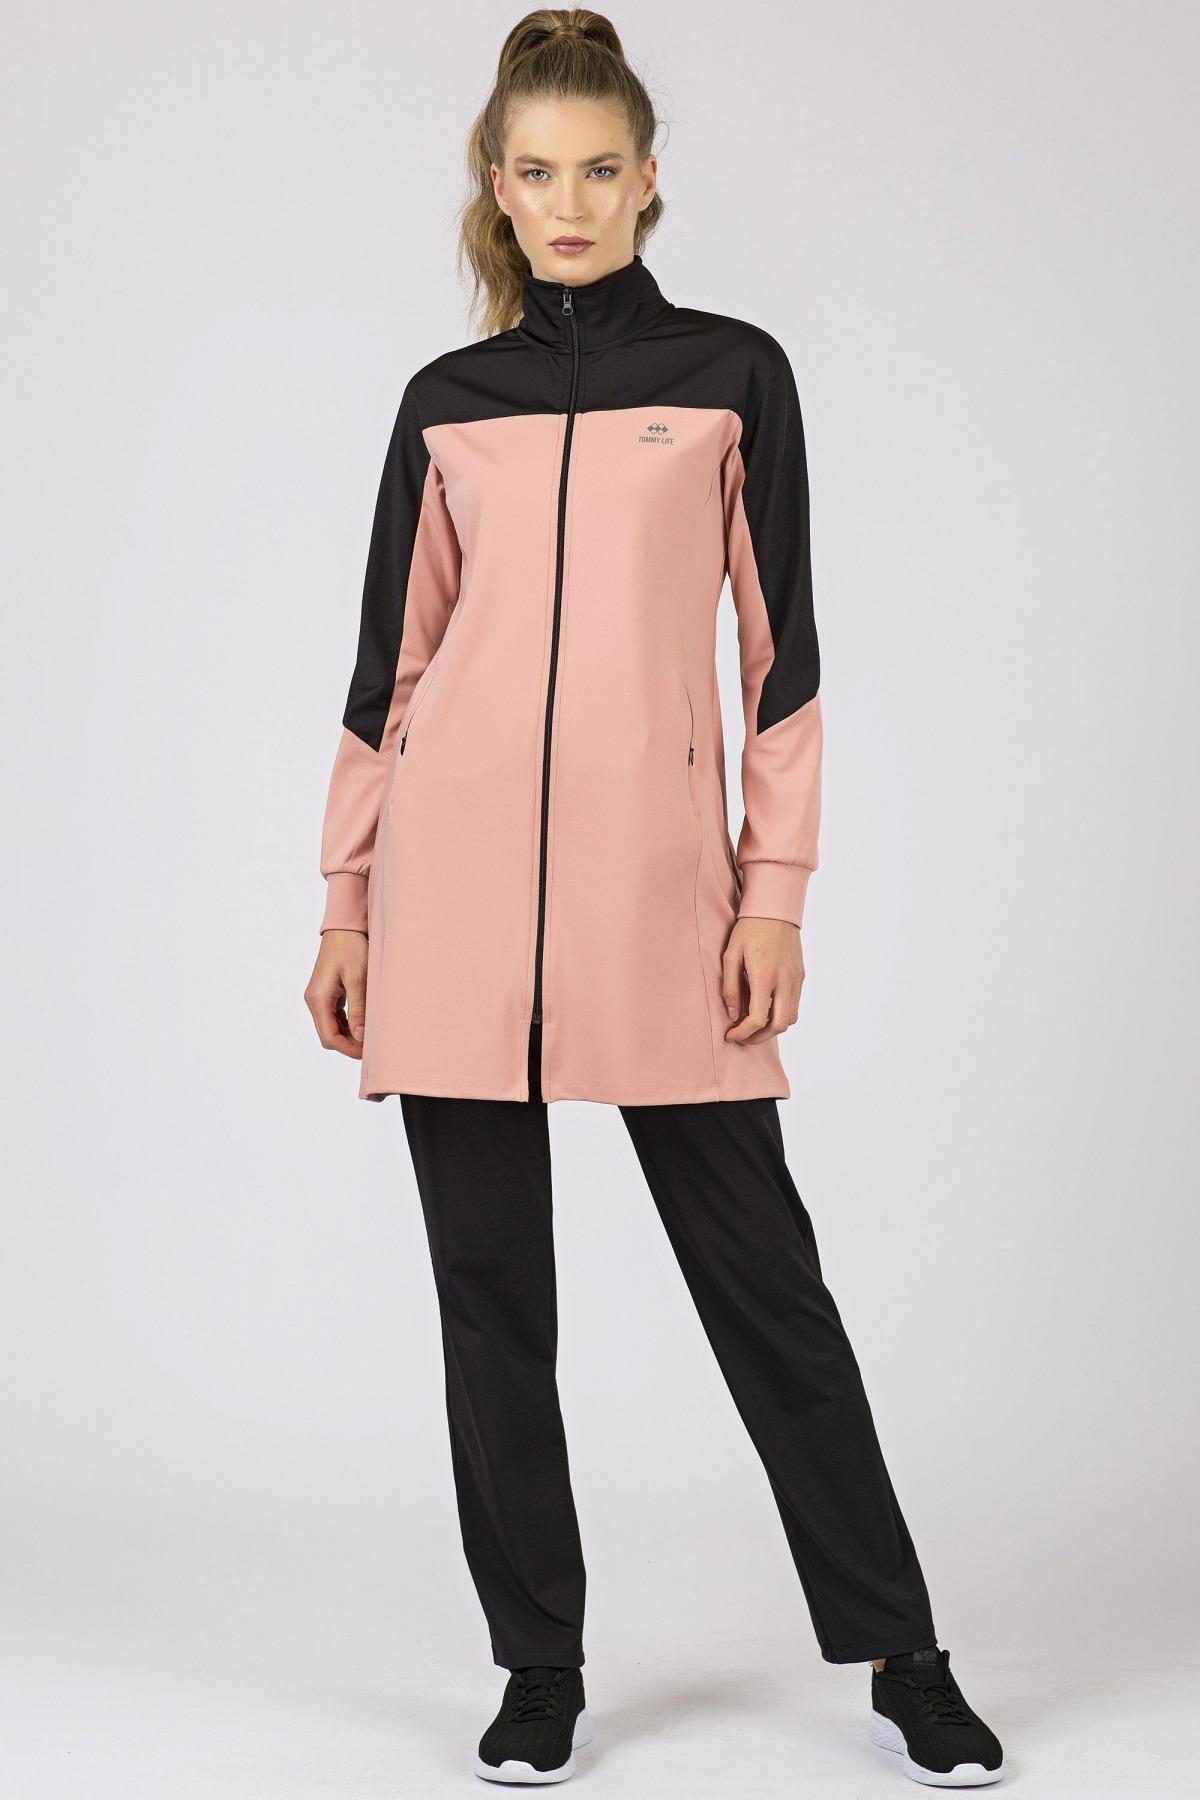 Women's Powder Rose Scuba Fabric Sweat Suit- 2 Pieces